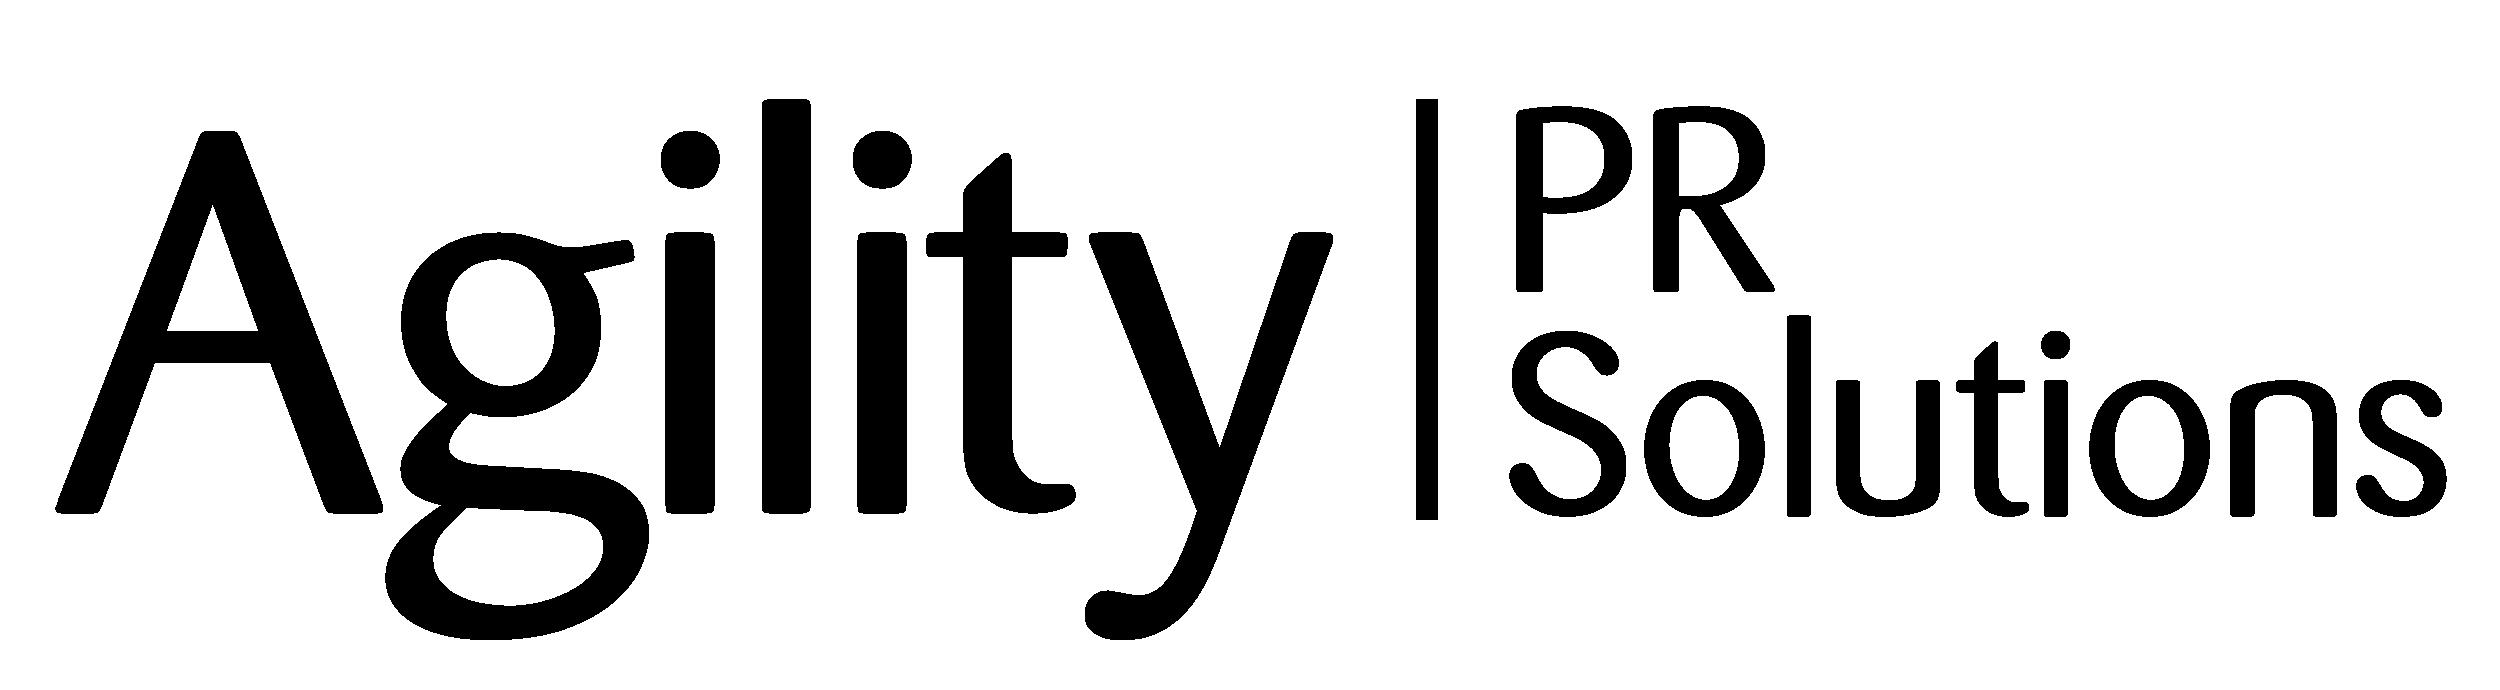 Agility Horizontal Black logo